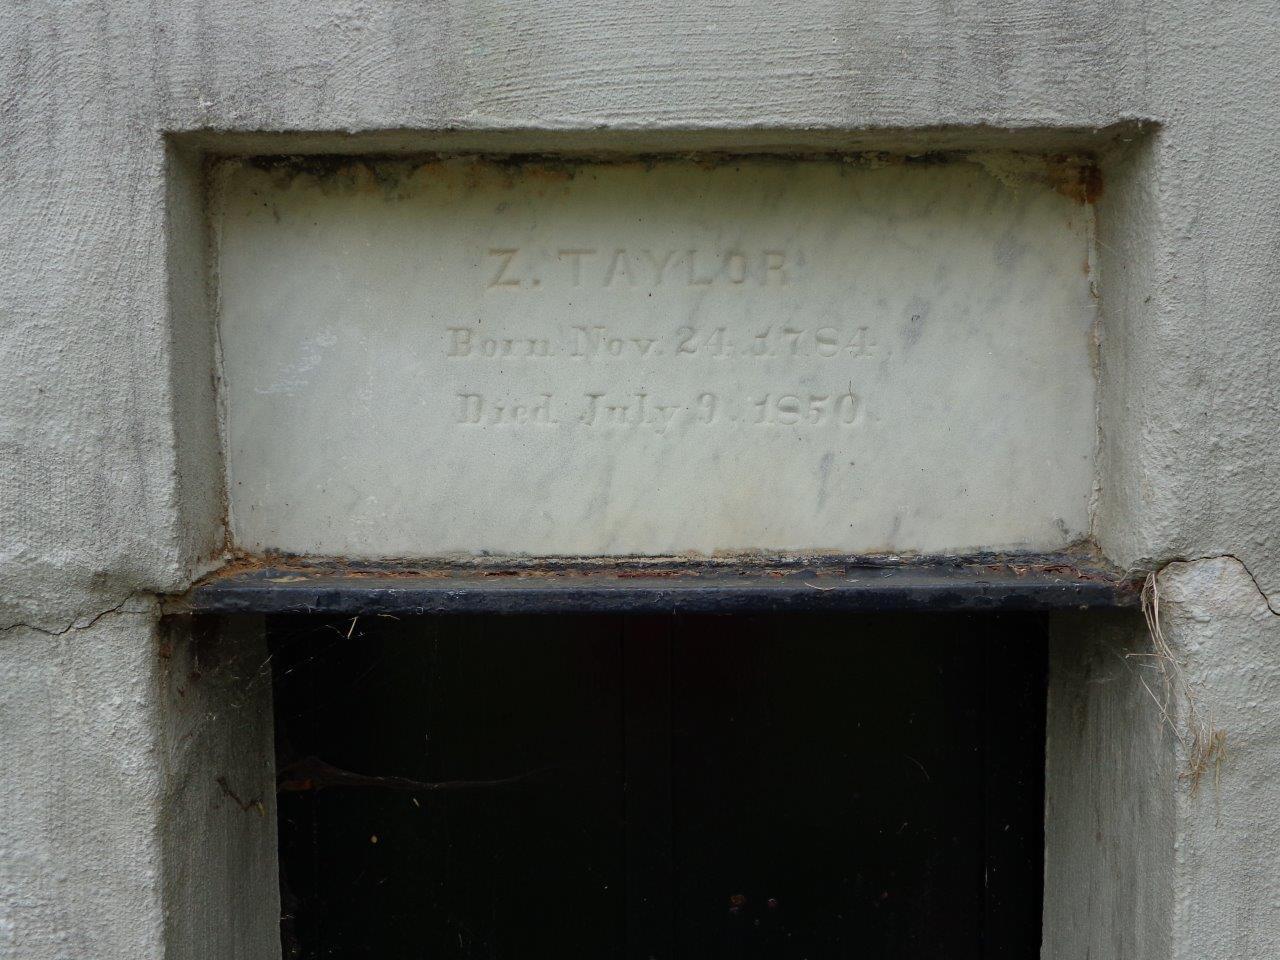 Zachary Taylor original gravesite